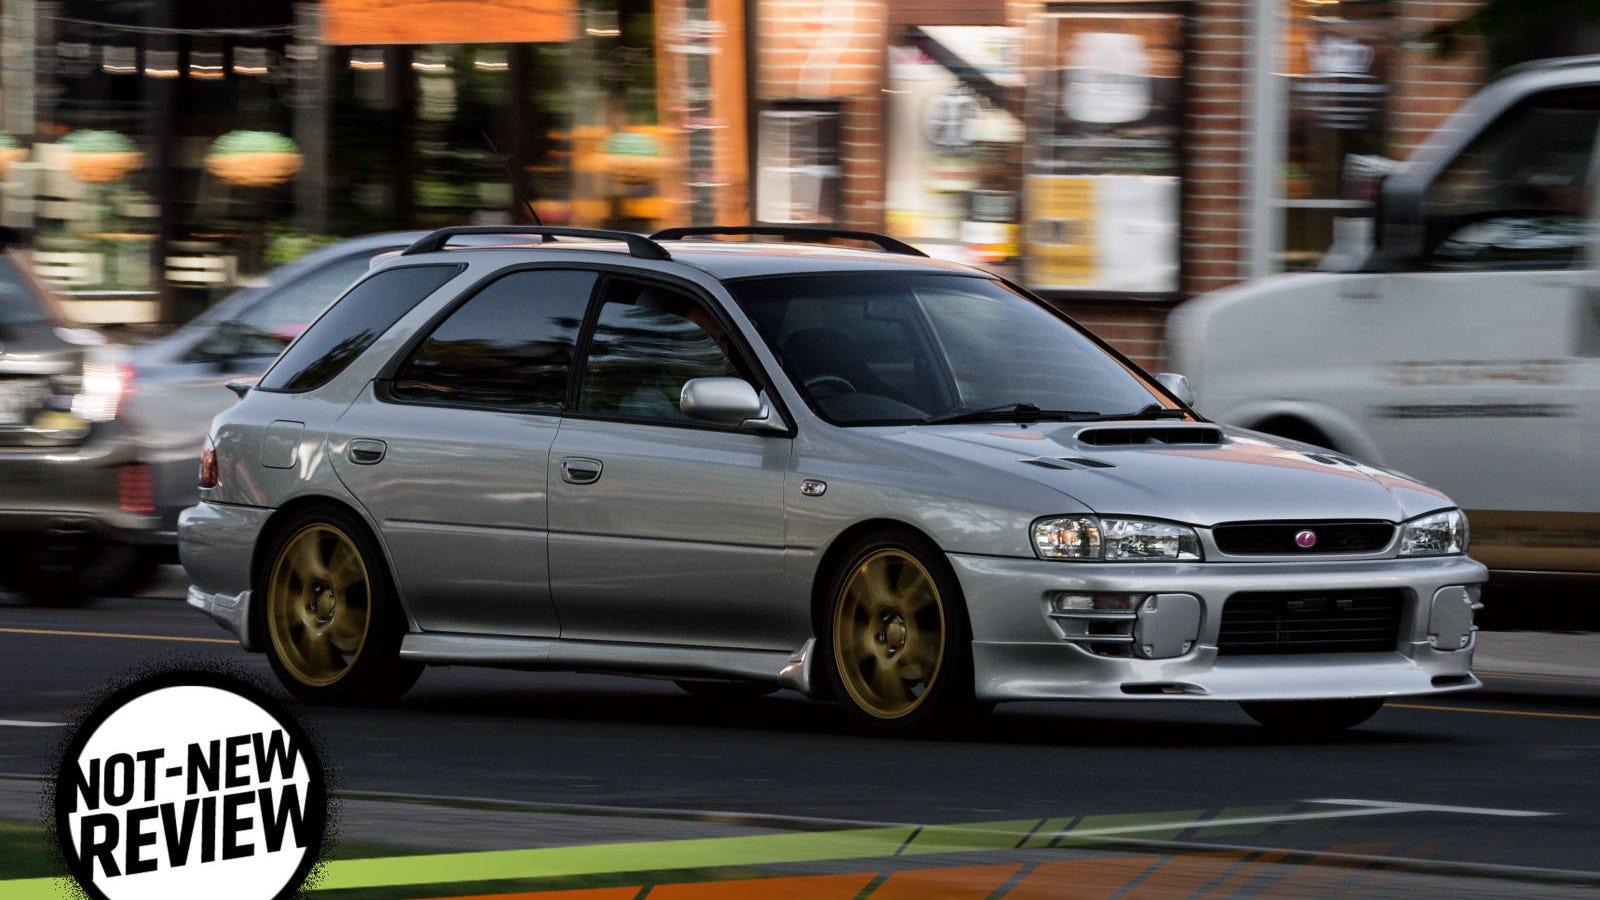 2000 subaru impreza wagon review